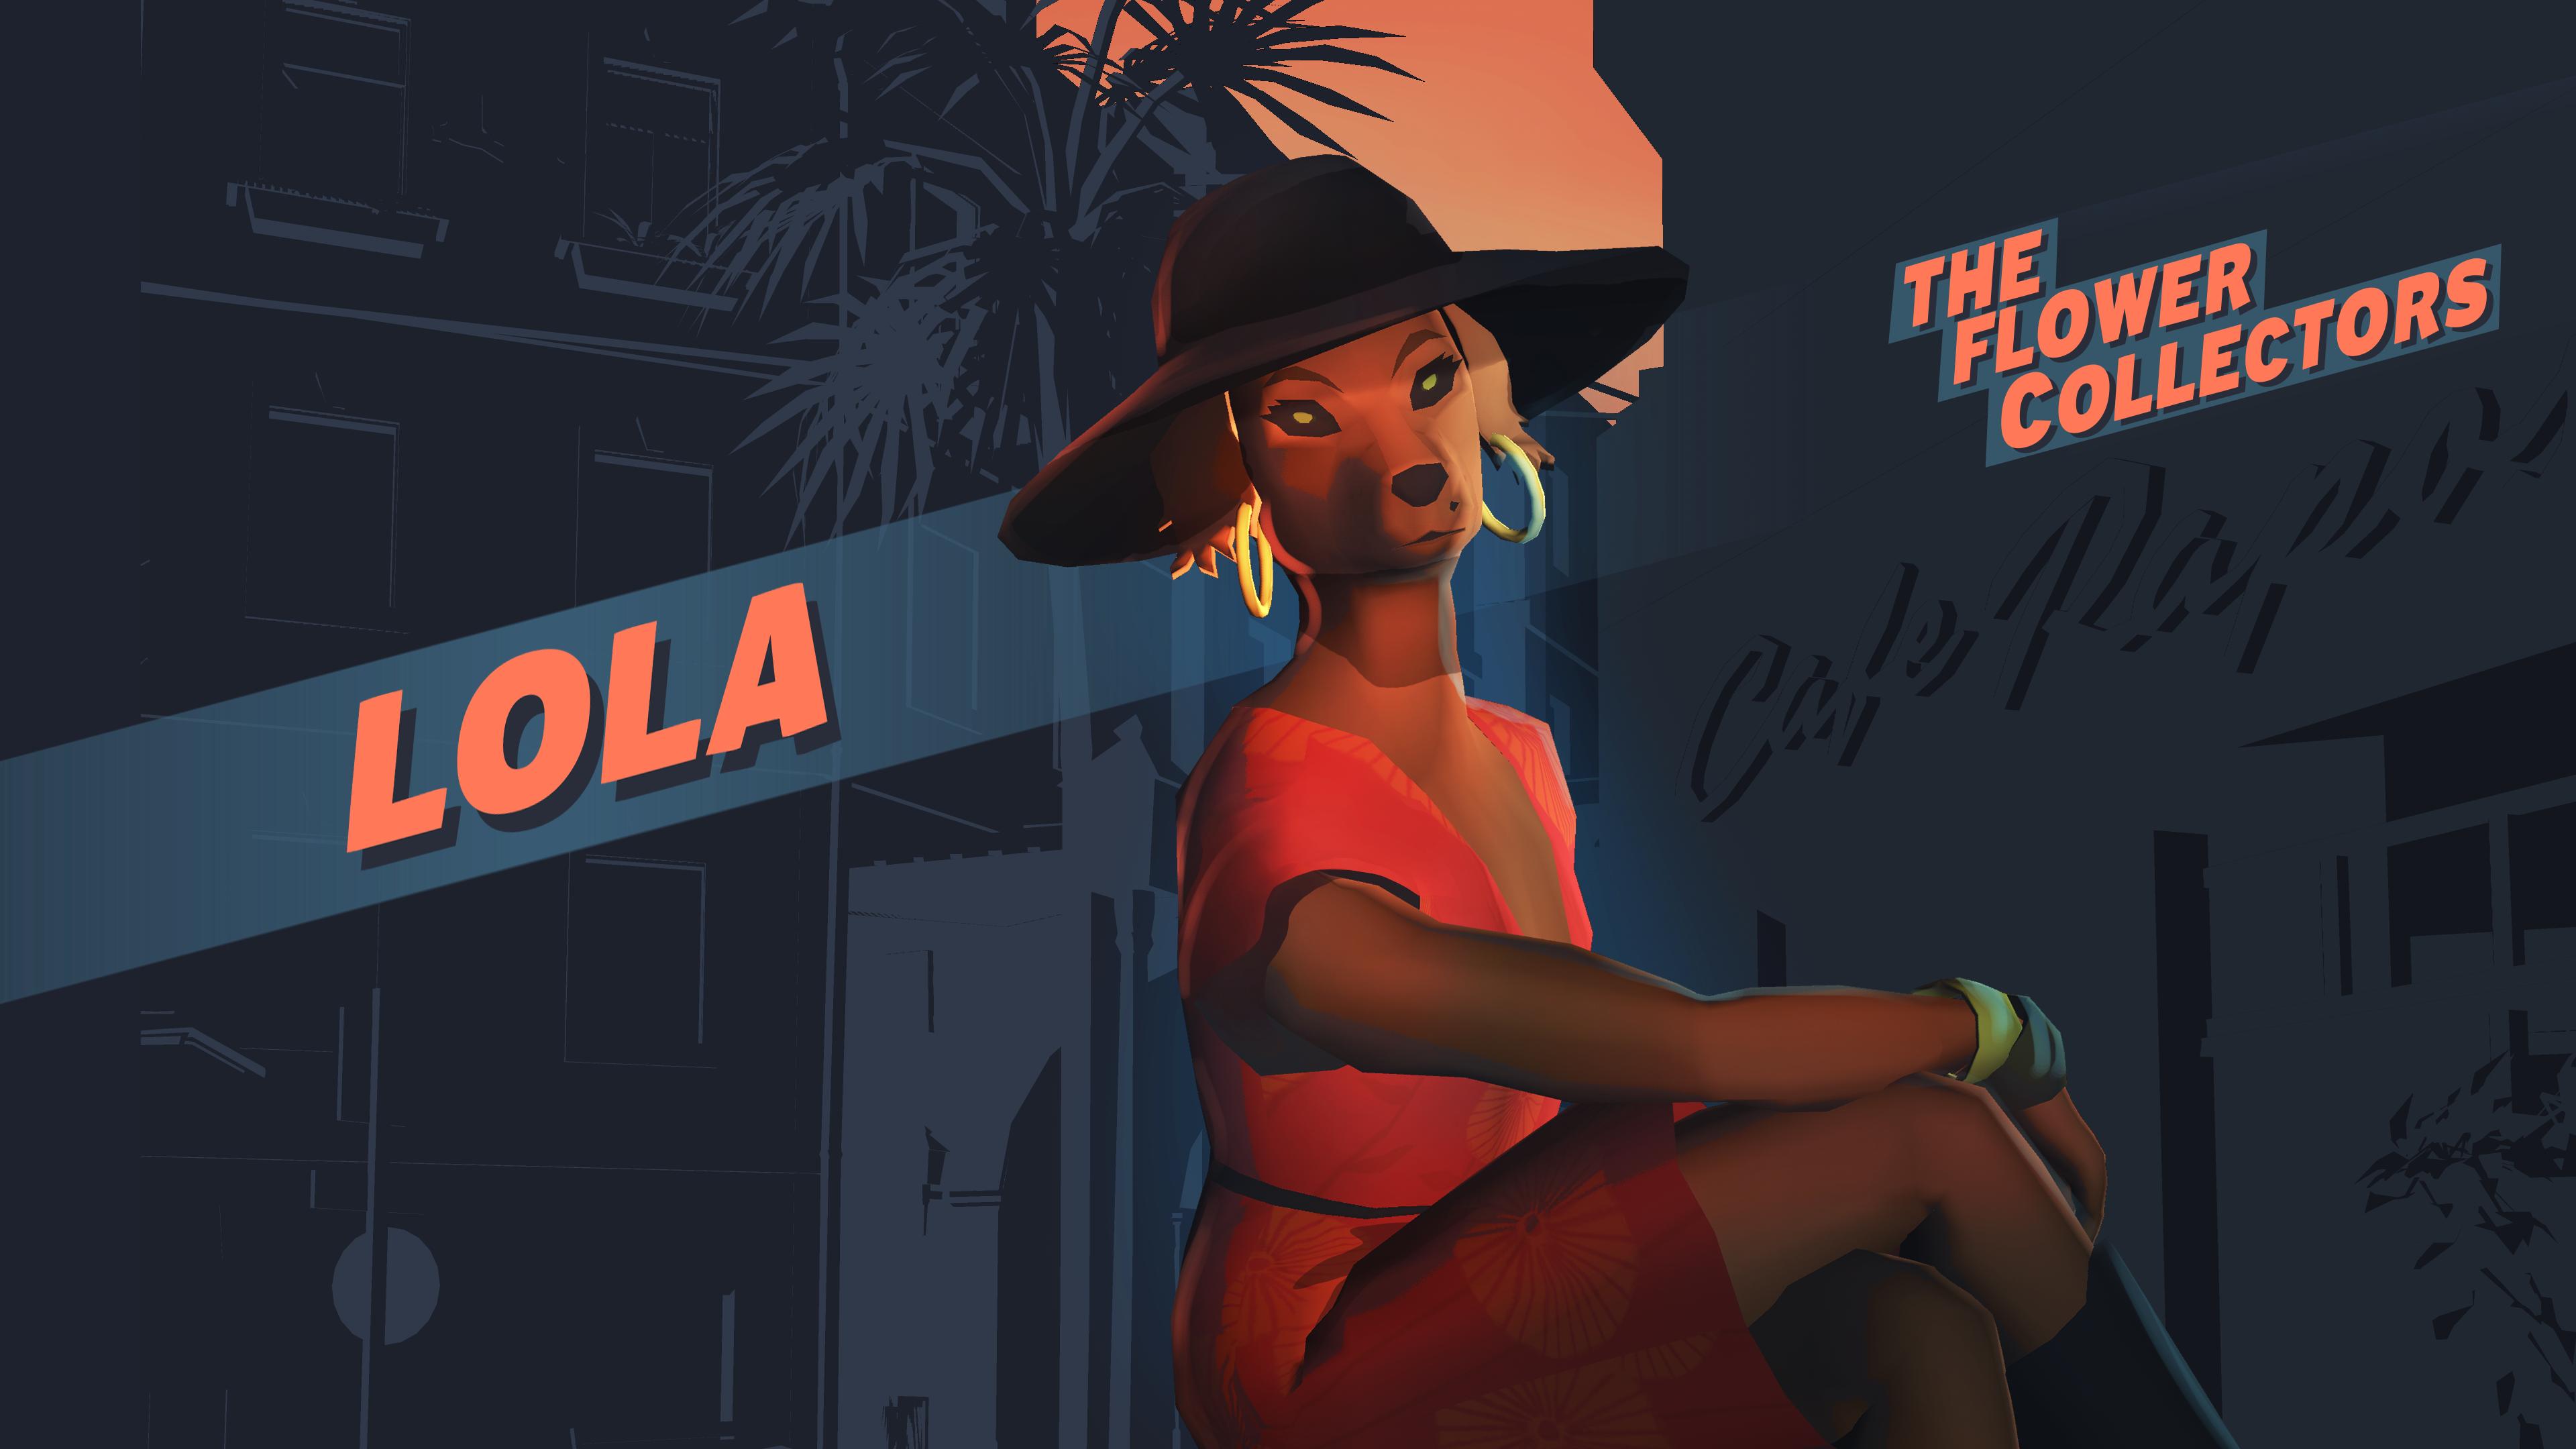 TheFlowerCollectors_Lola